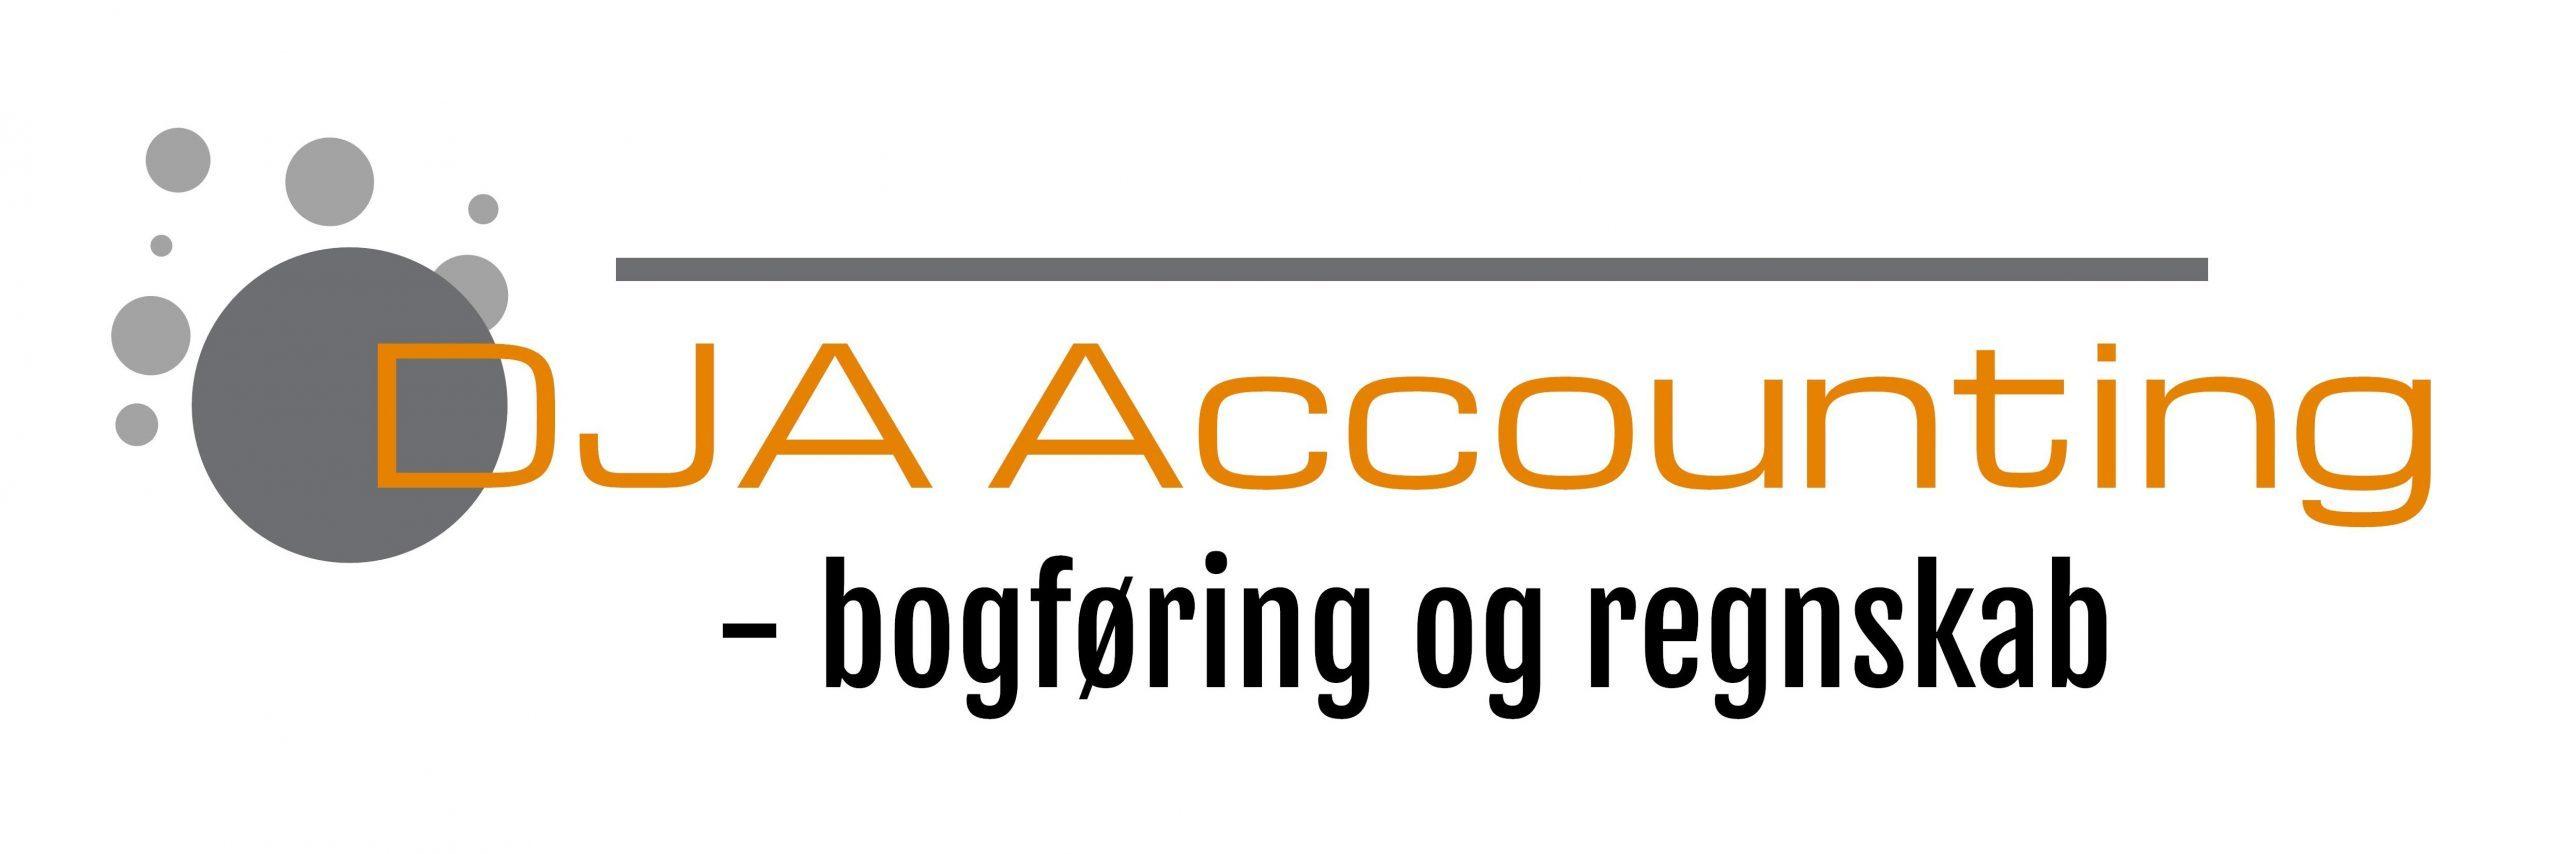 DJA Accounting